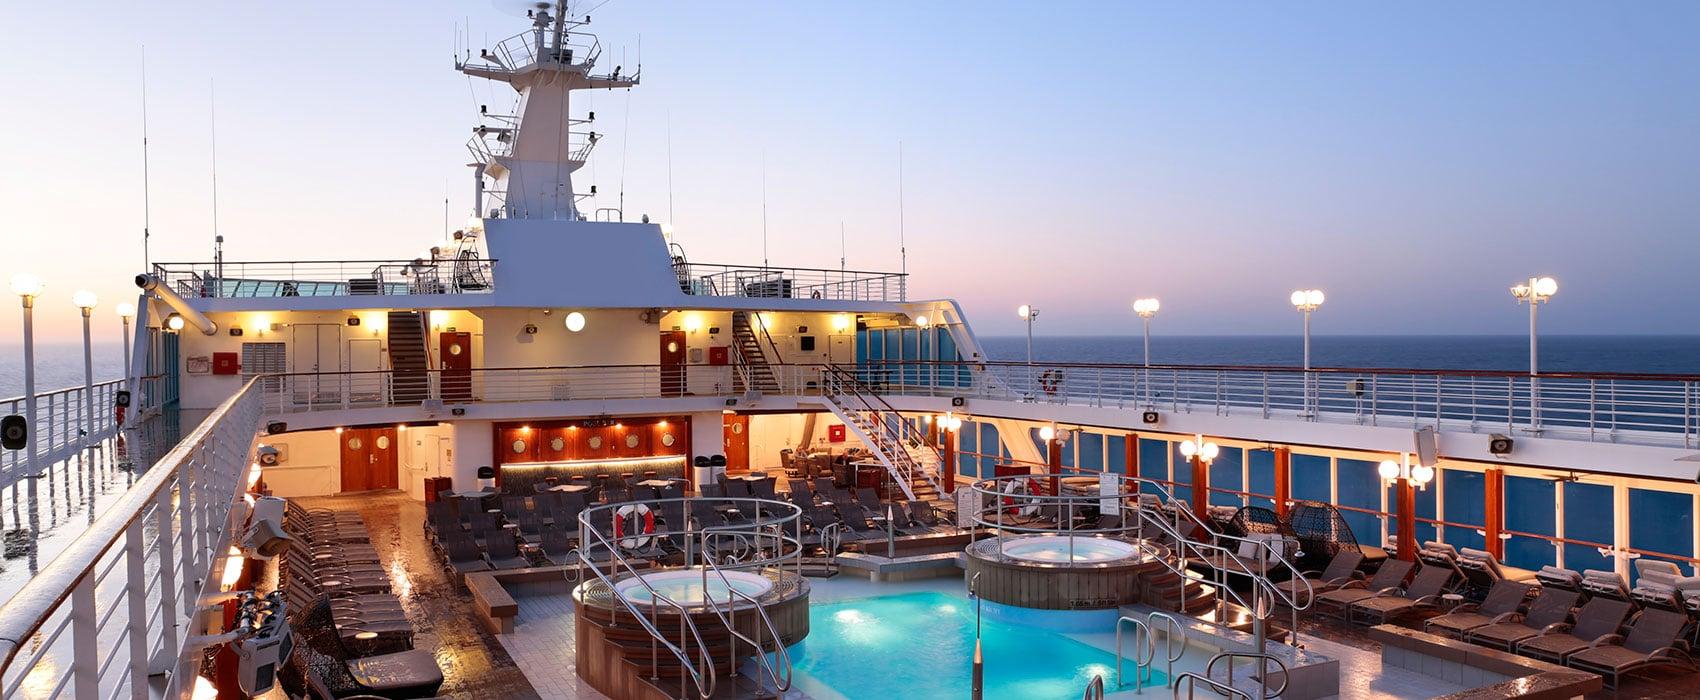 Desire Barcelona-Rome Cruise | Ship Specifications